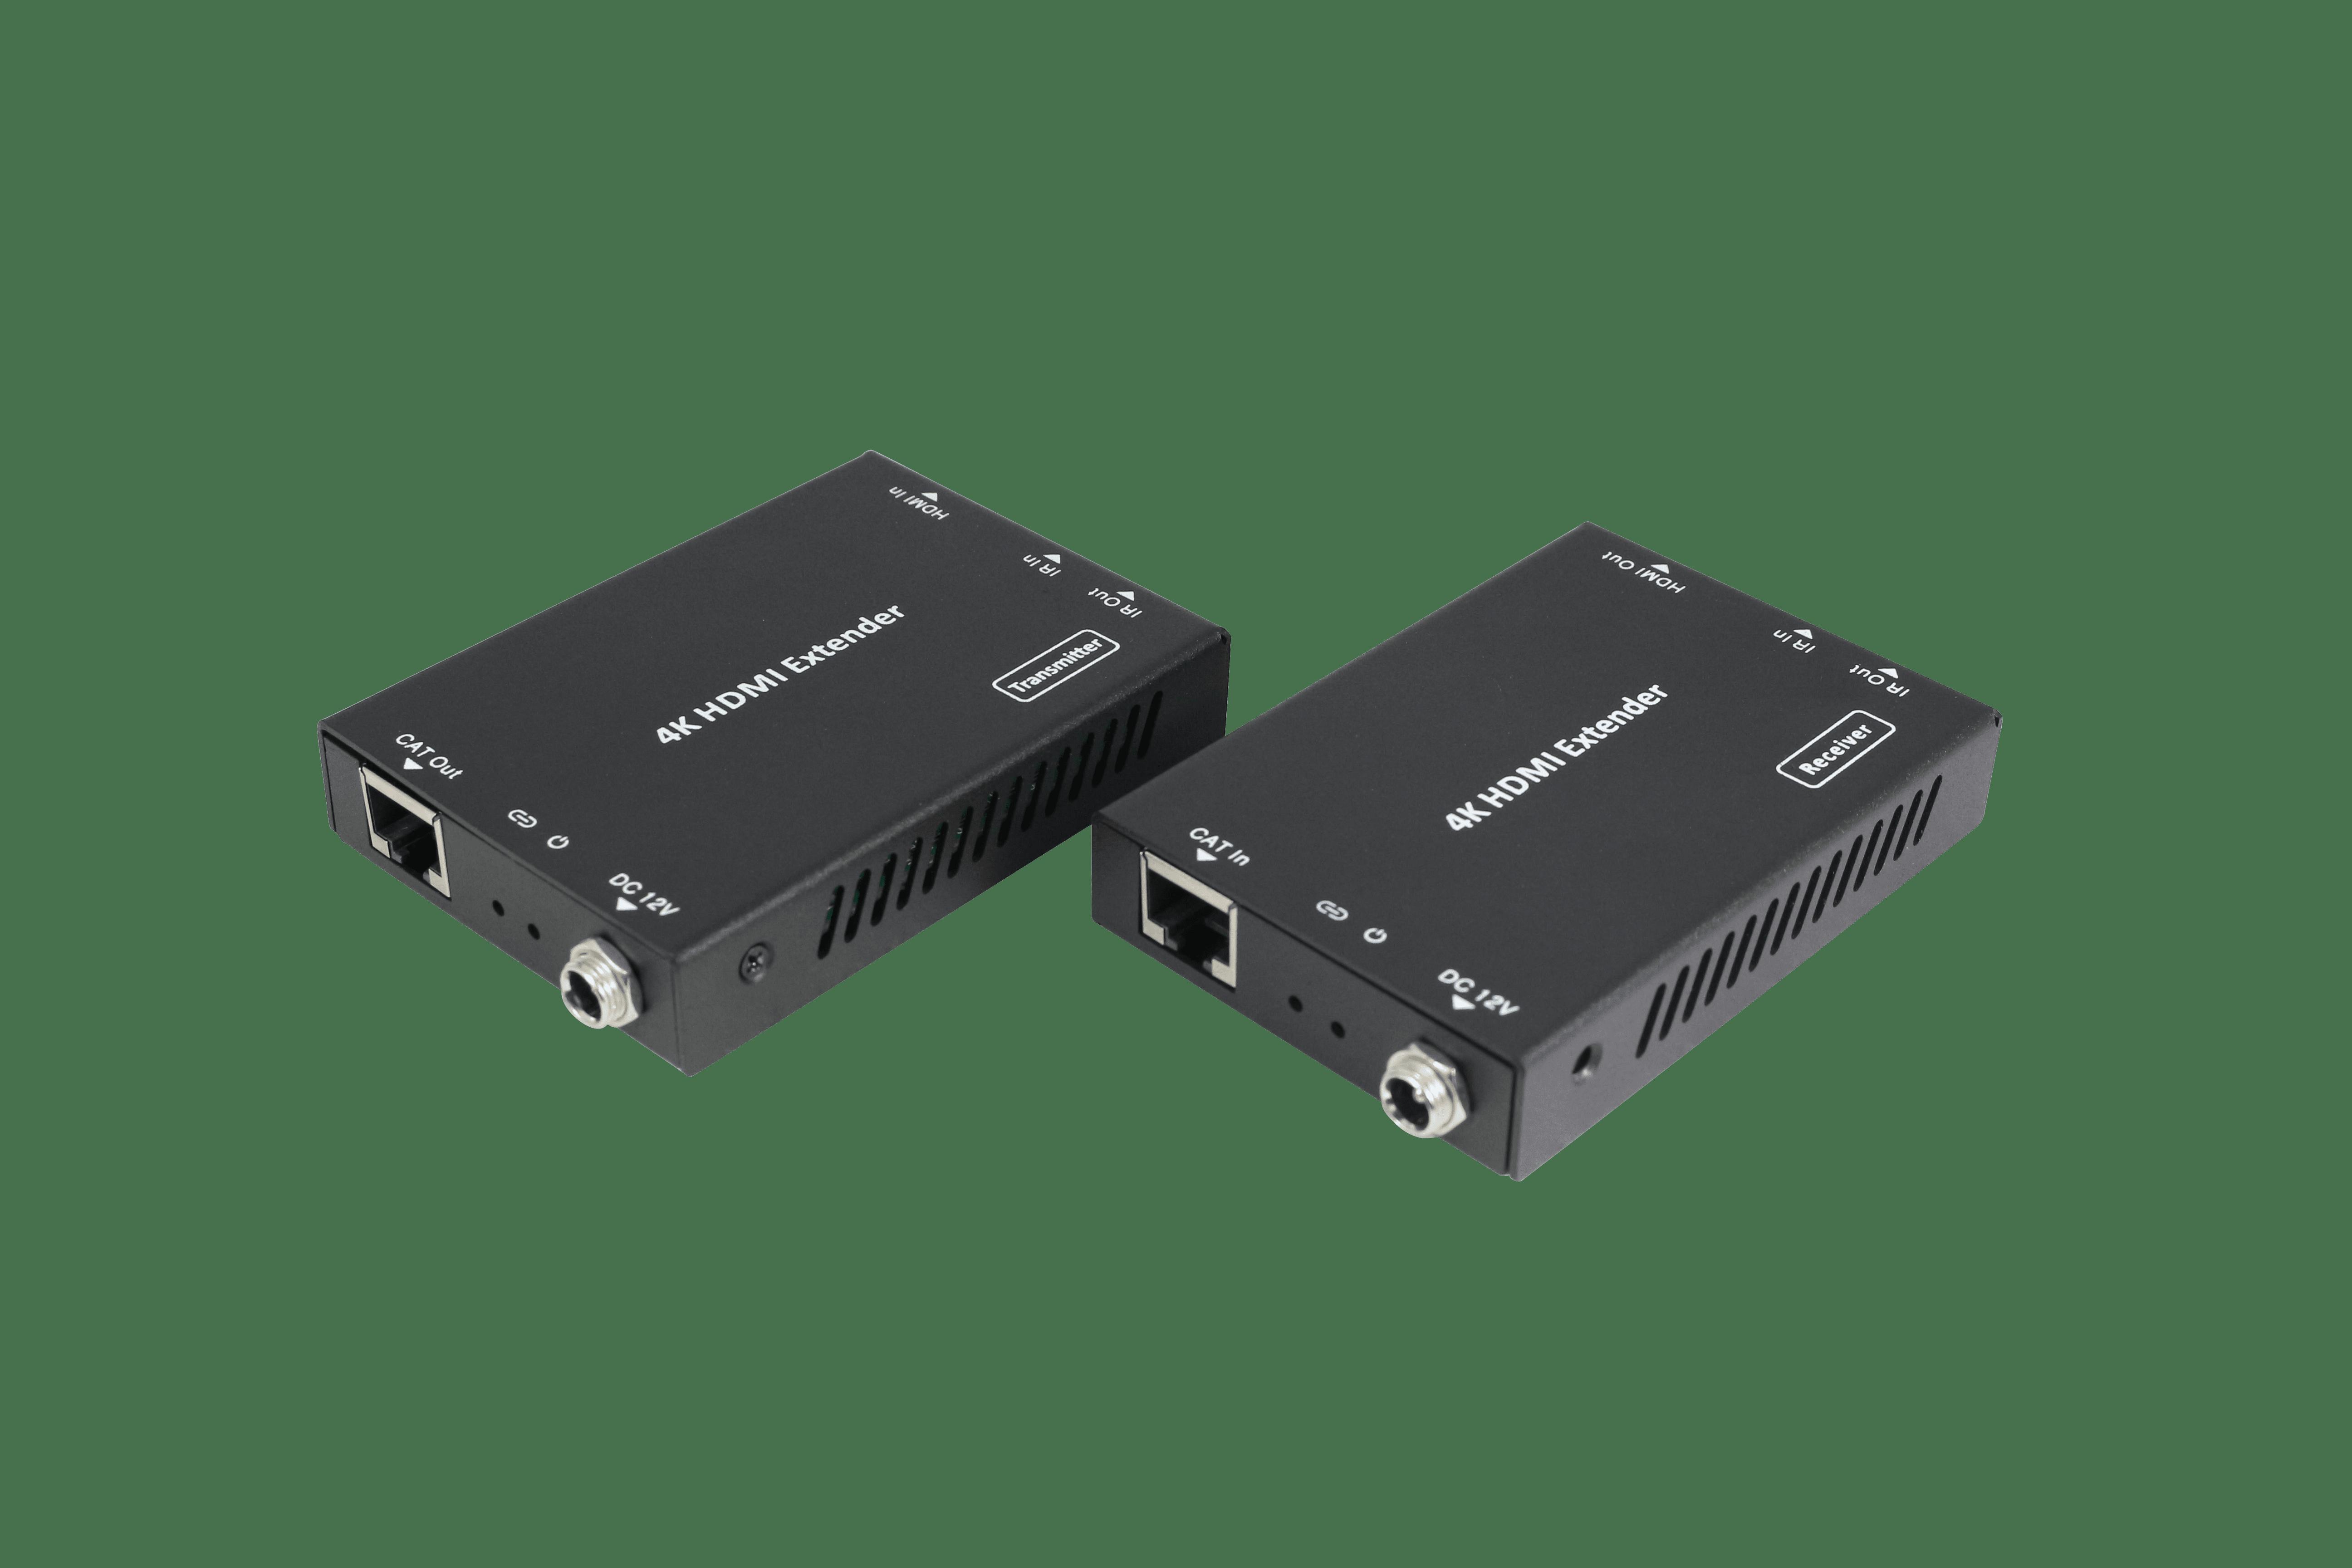 HDCVT HDMI 4K Extender - Syntech